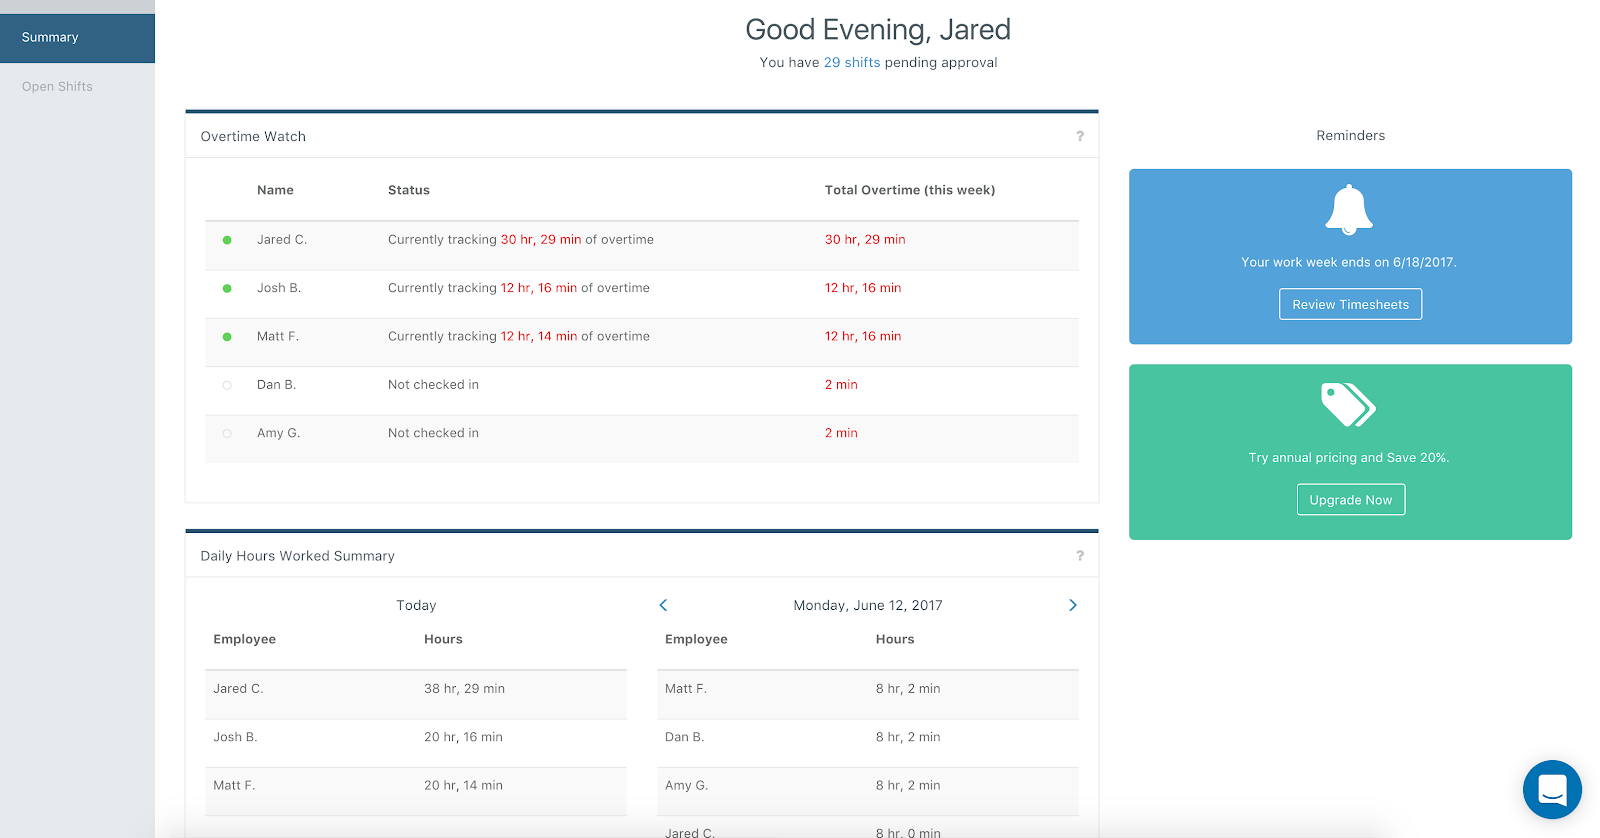 Screenshot showing the Summary Dashboard